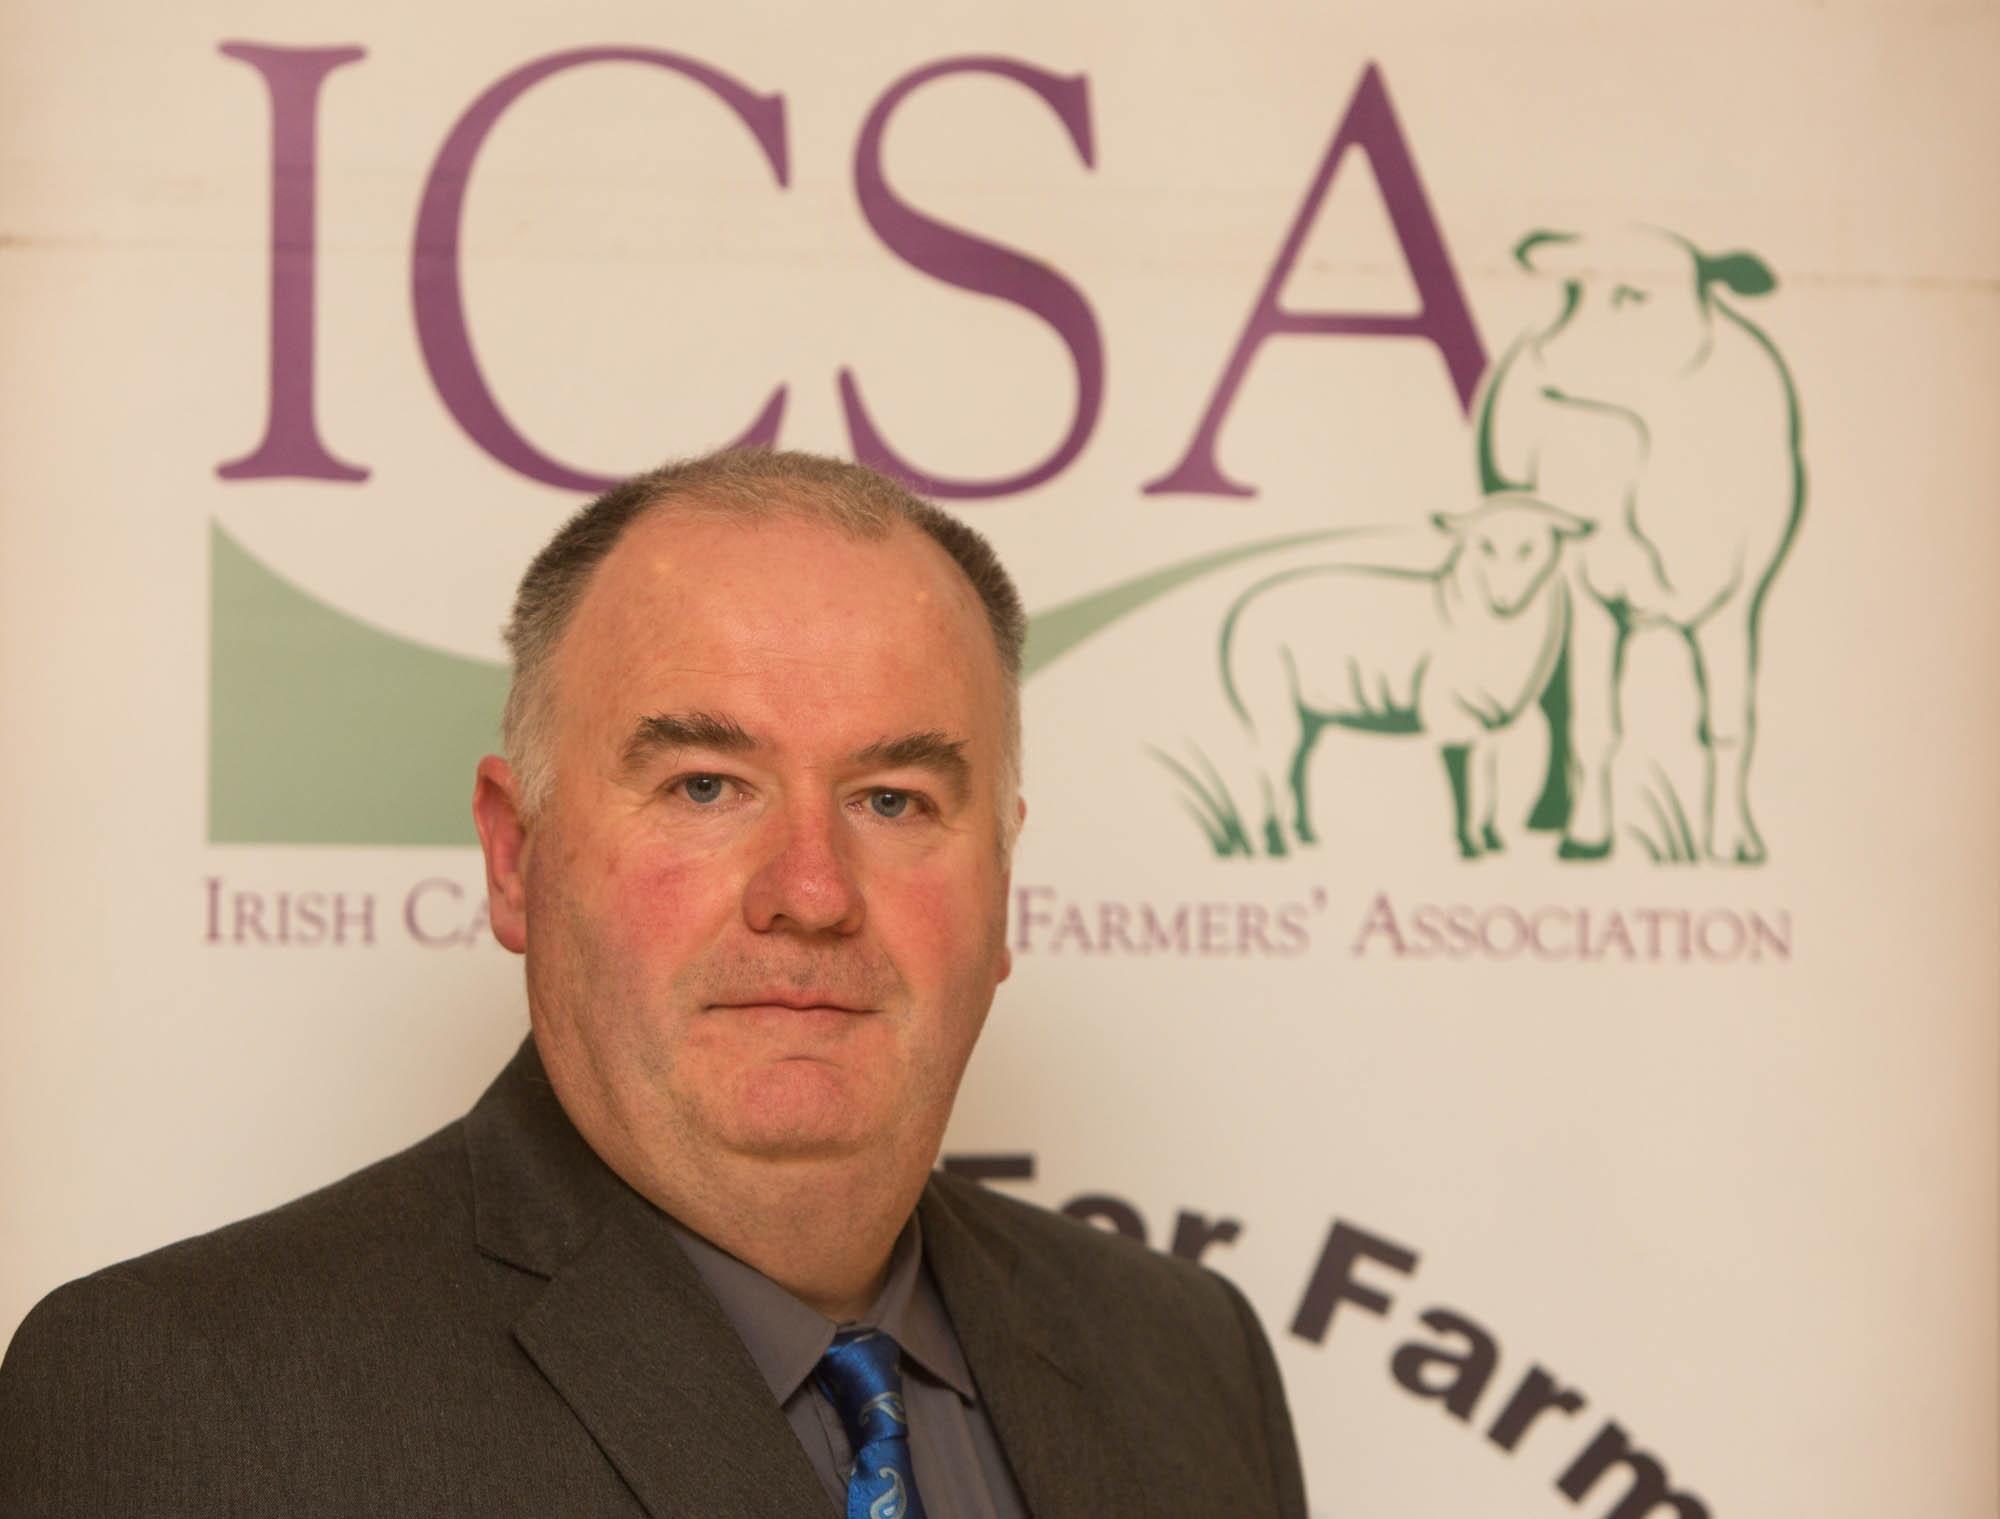 ICSA Rural Development Chairman, Seamus Sherlock